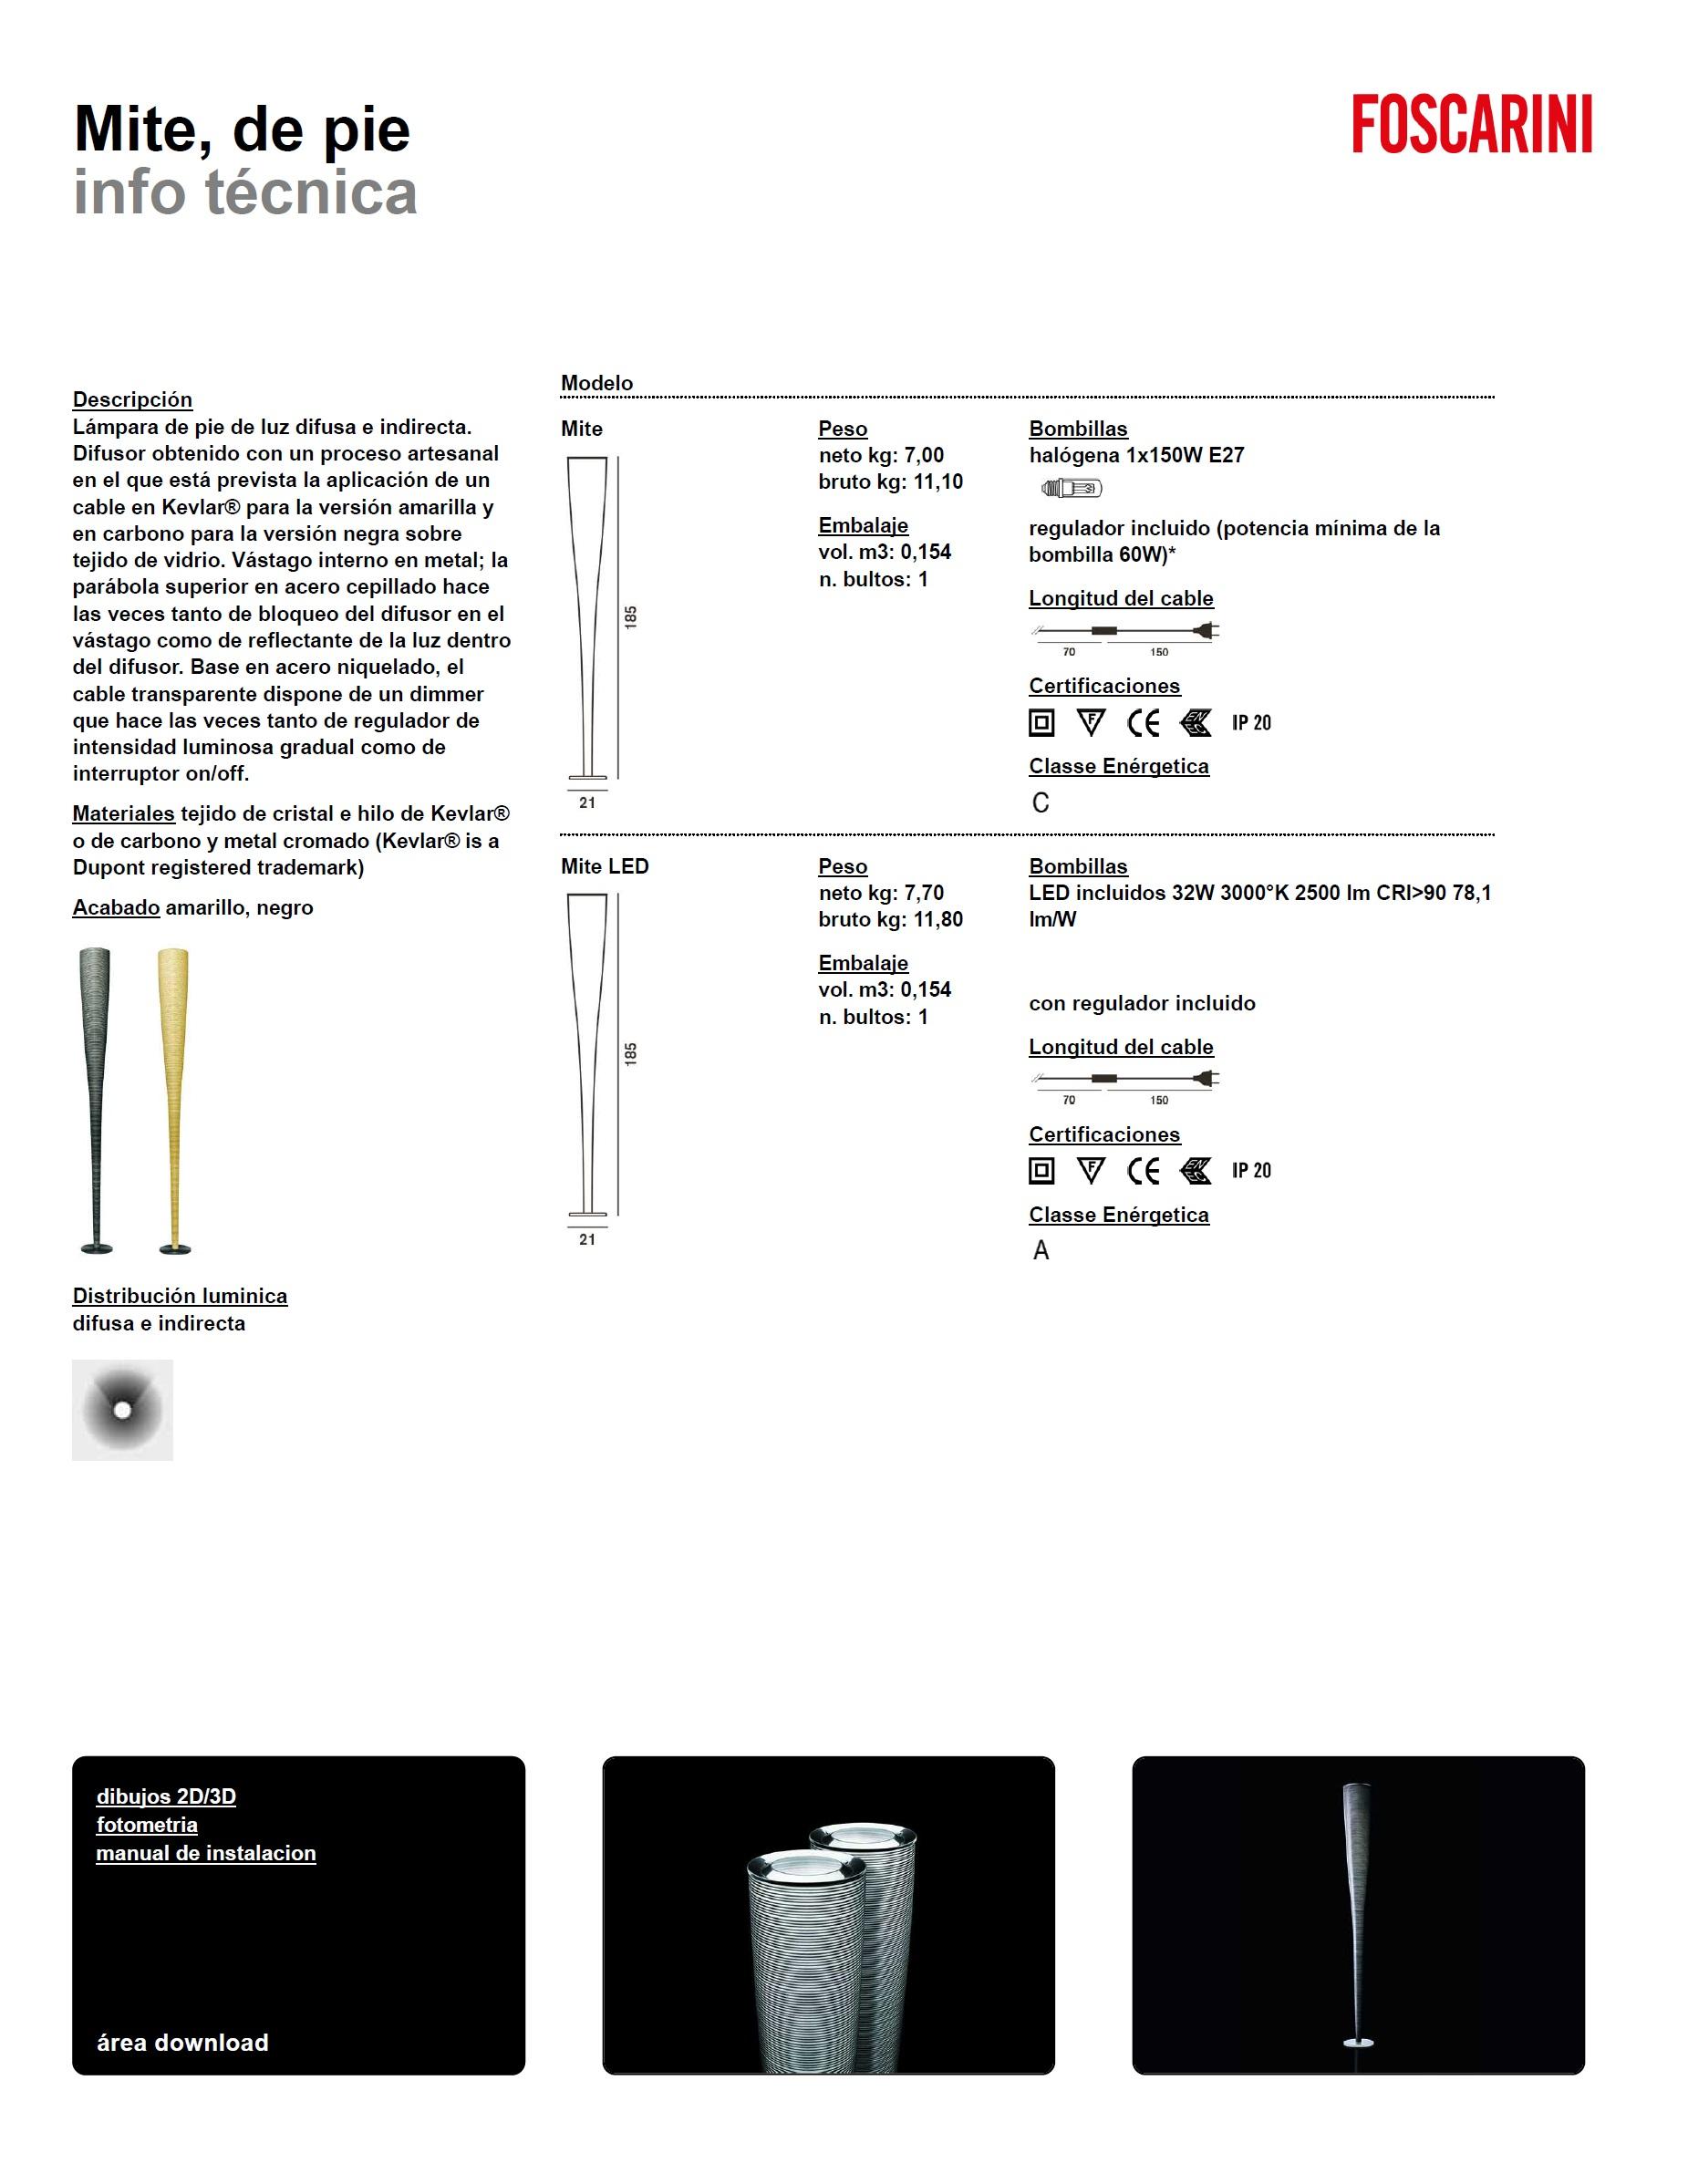 foscarini mite stehlampe led schwarz 111003l 20 l mparas. Black Bedroom Furniture Sets. Home Design Ideas